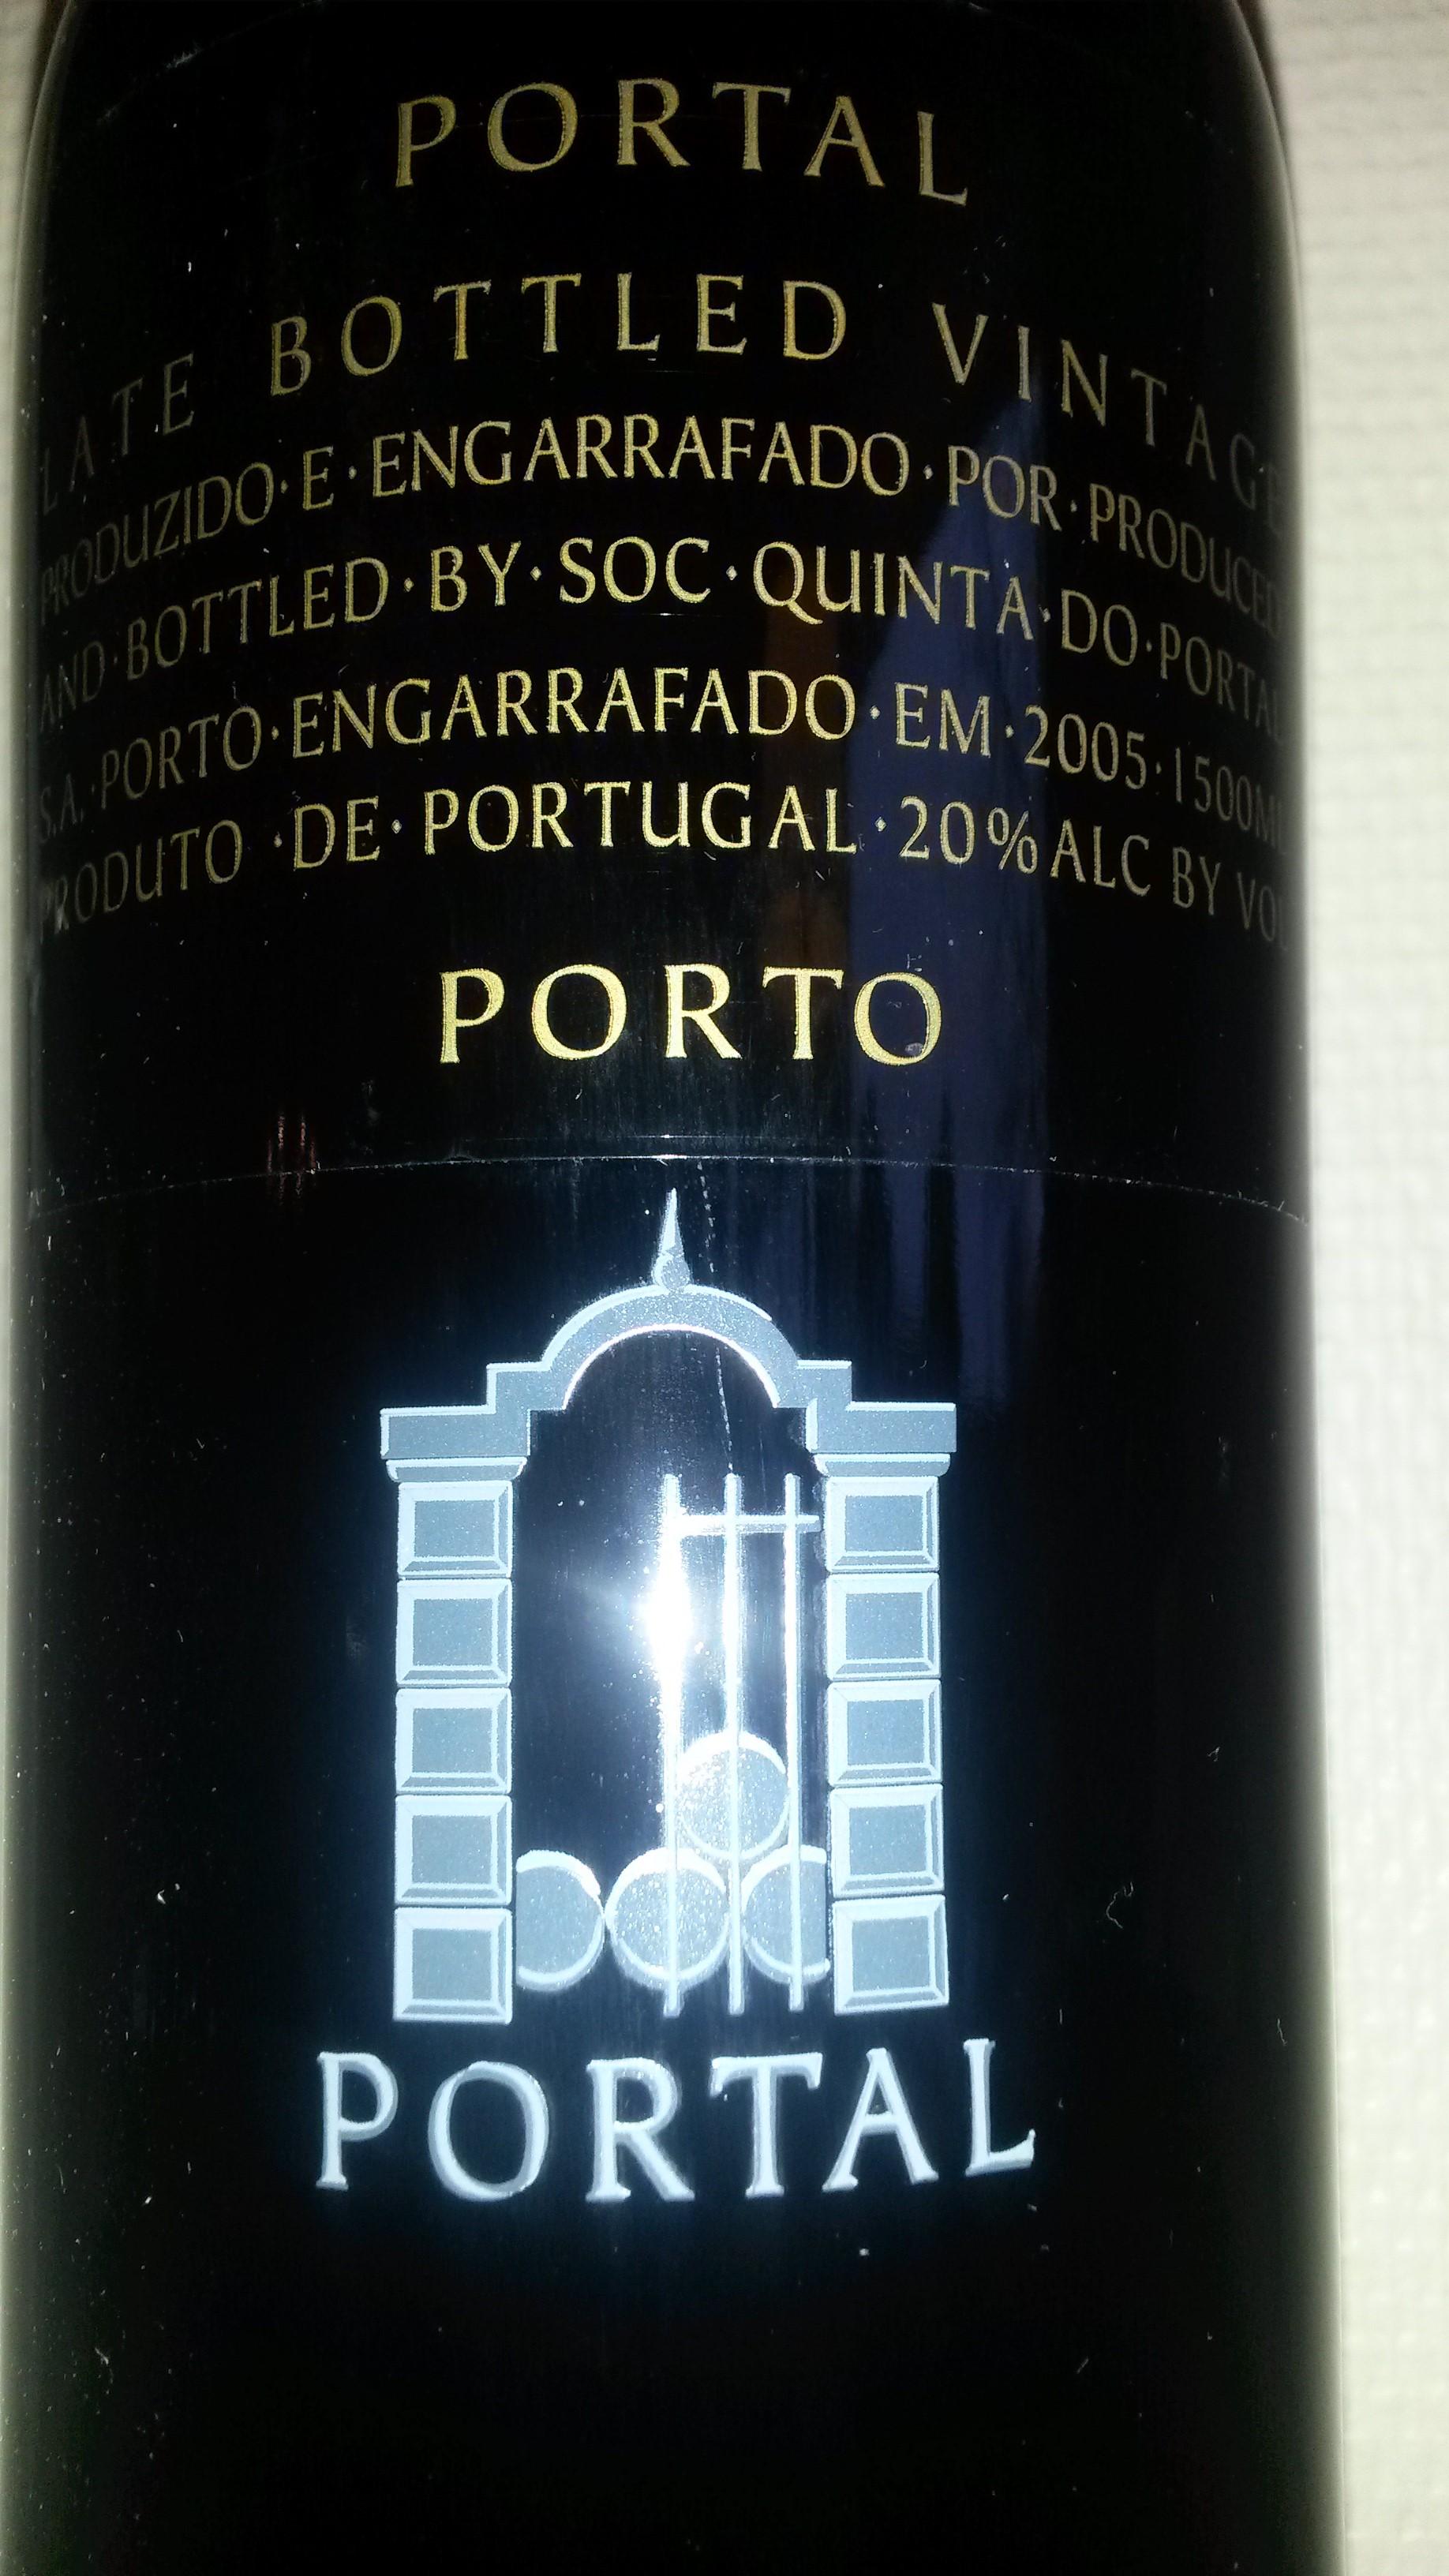 Portal LBV